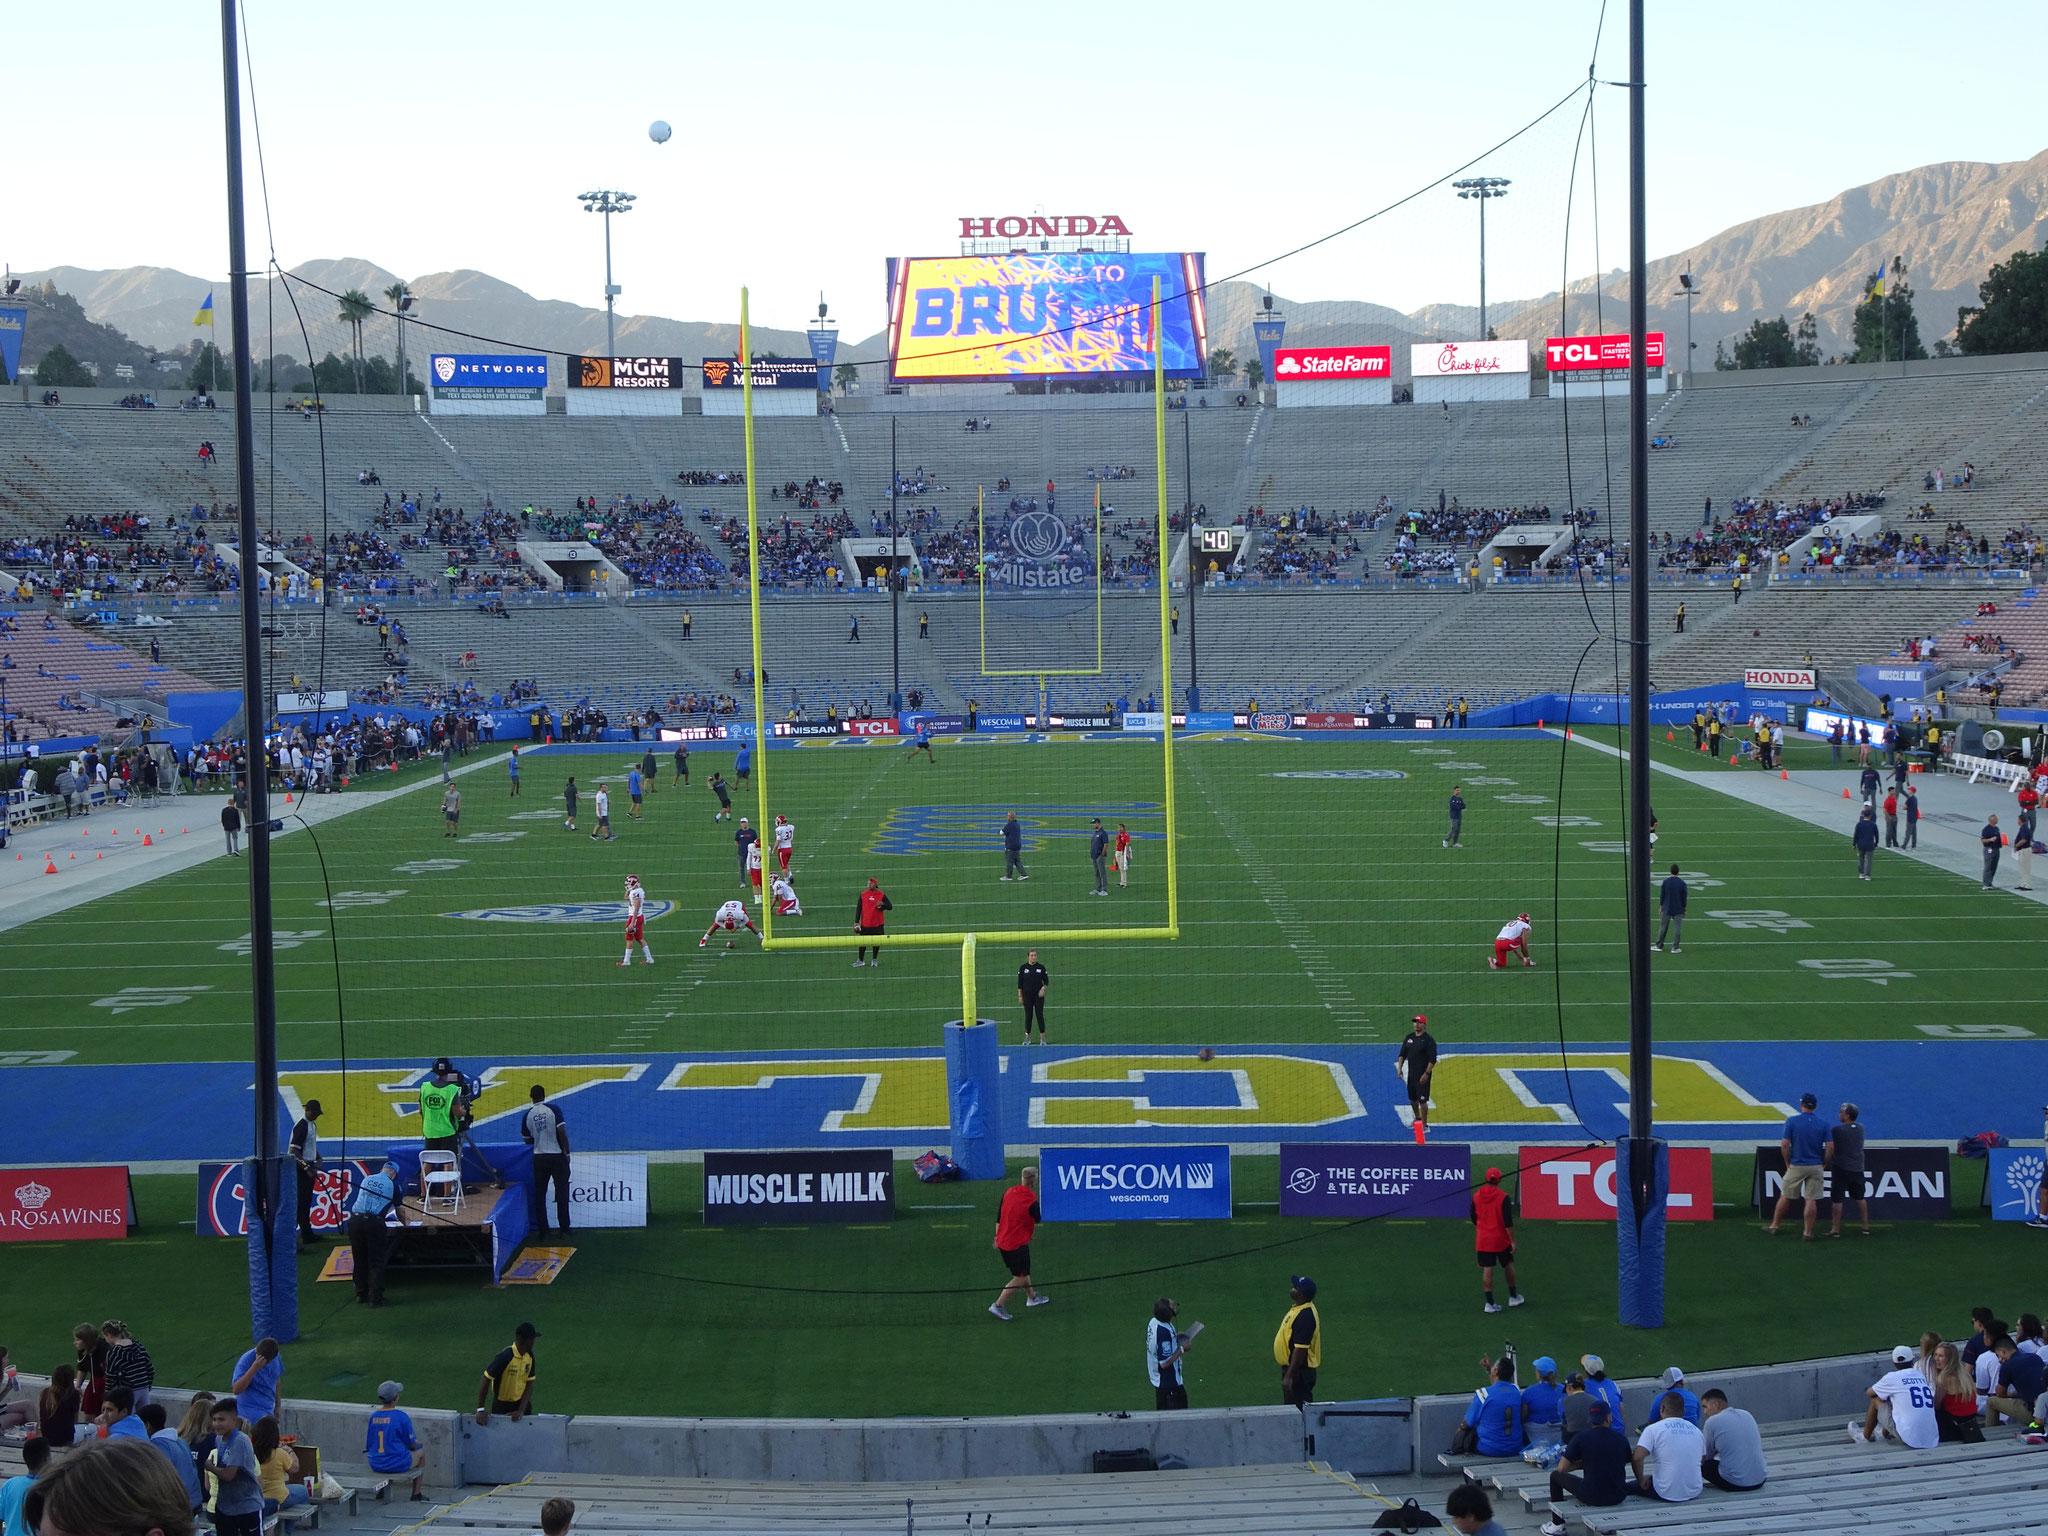 UCLA Bruins vs Bulldogs de Fresno State (2018/19)